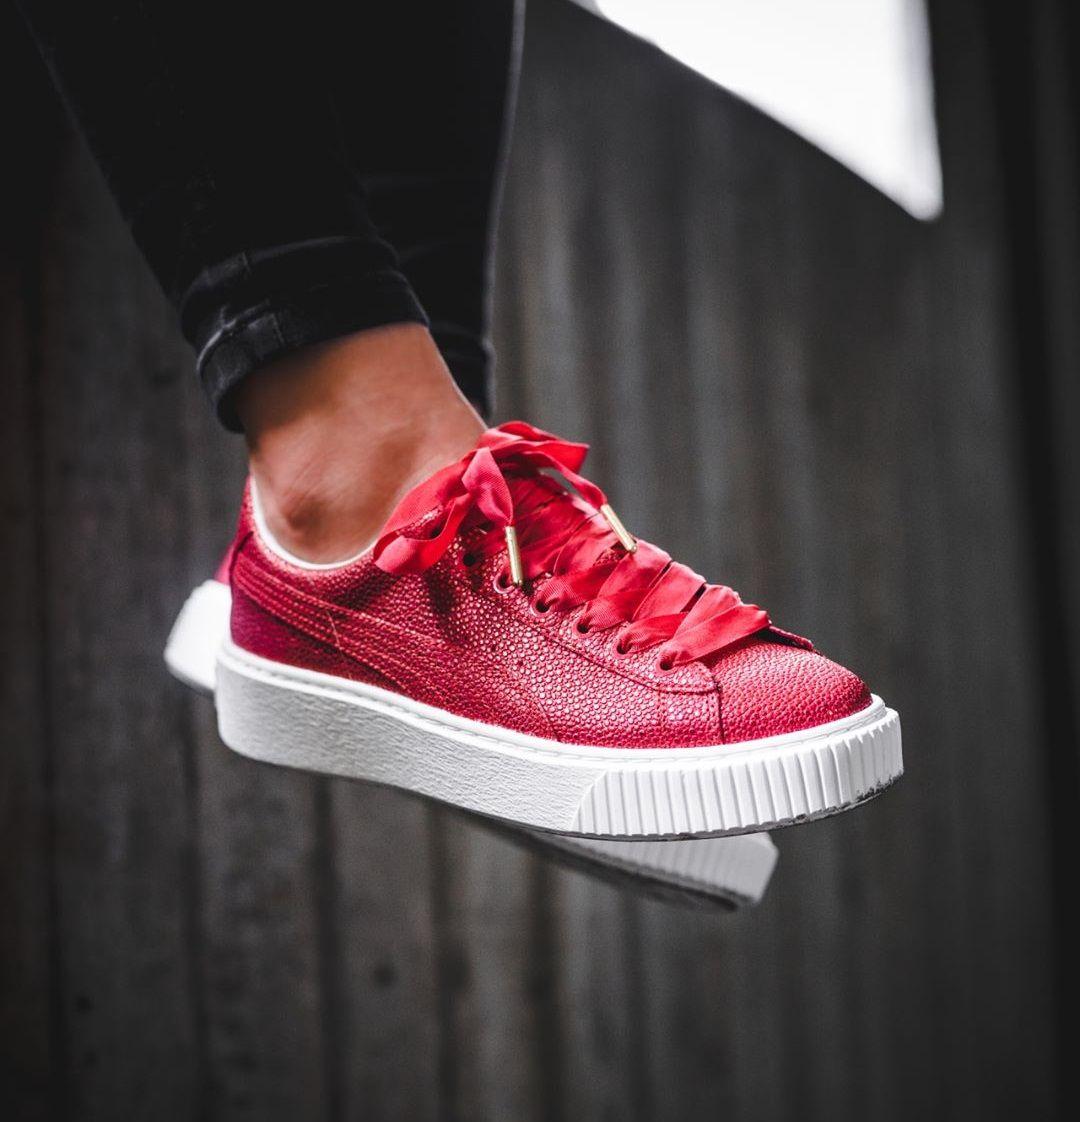 d4a28d4b239 Fenty by Rihanna x PUMA Ankle Strap Sneaker W